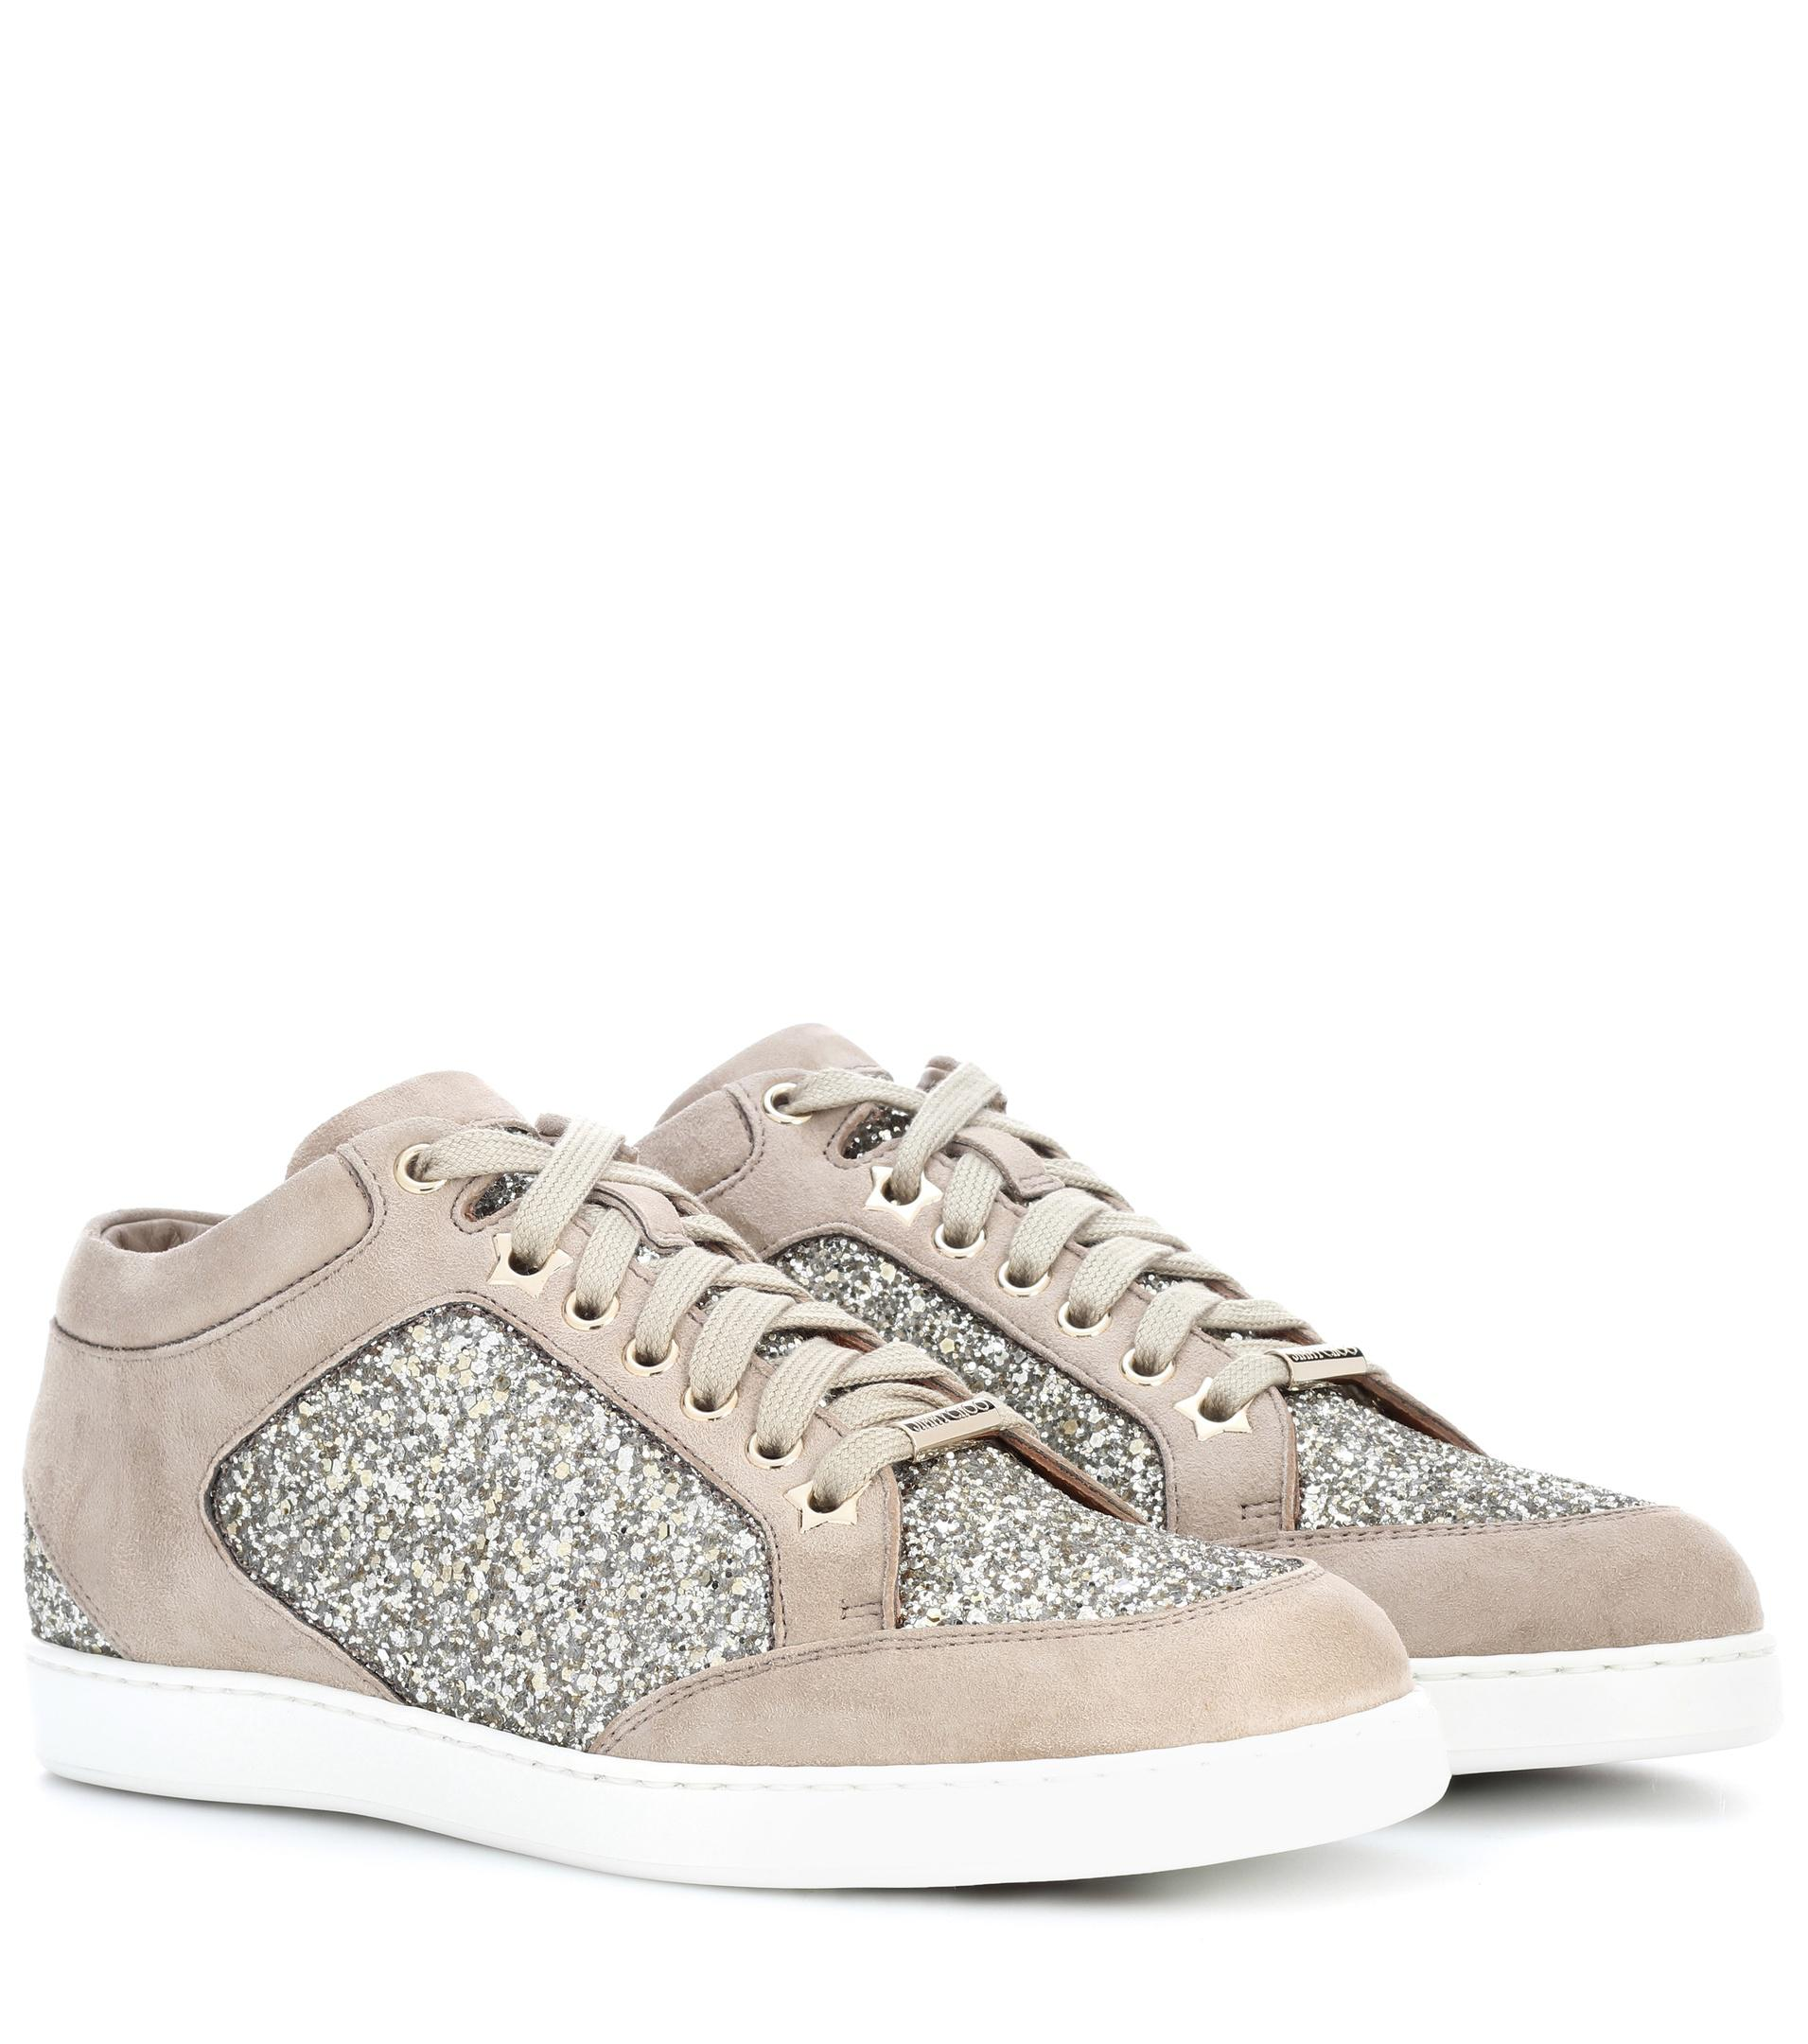 Jimmy choo Sneakers MIAMI calfskin glitter Glitter Logo MXOr2X87